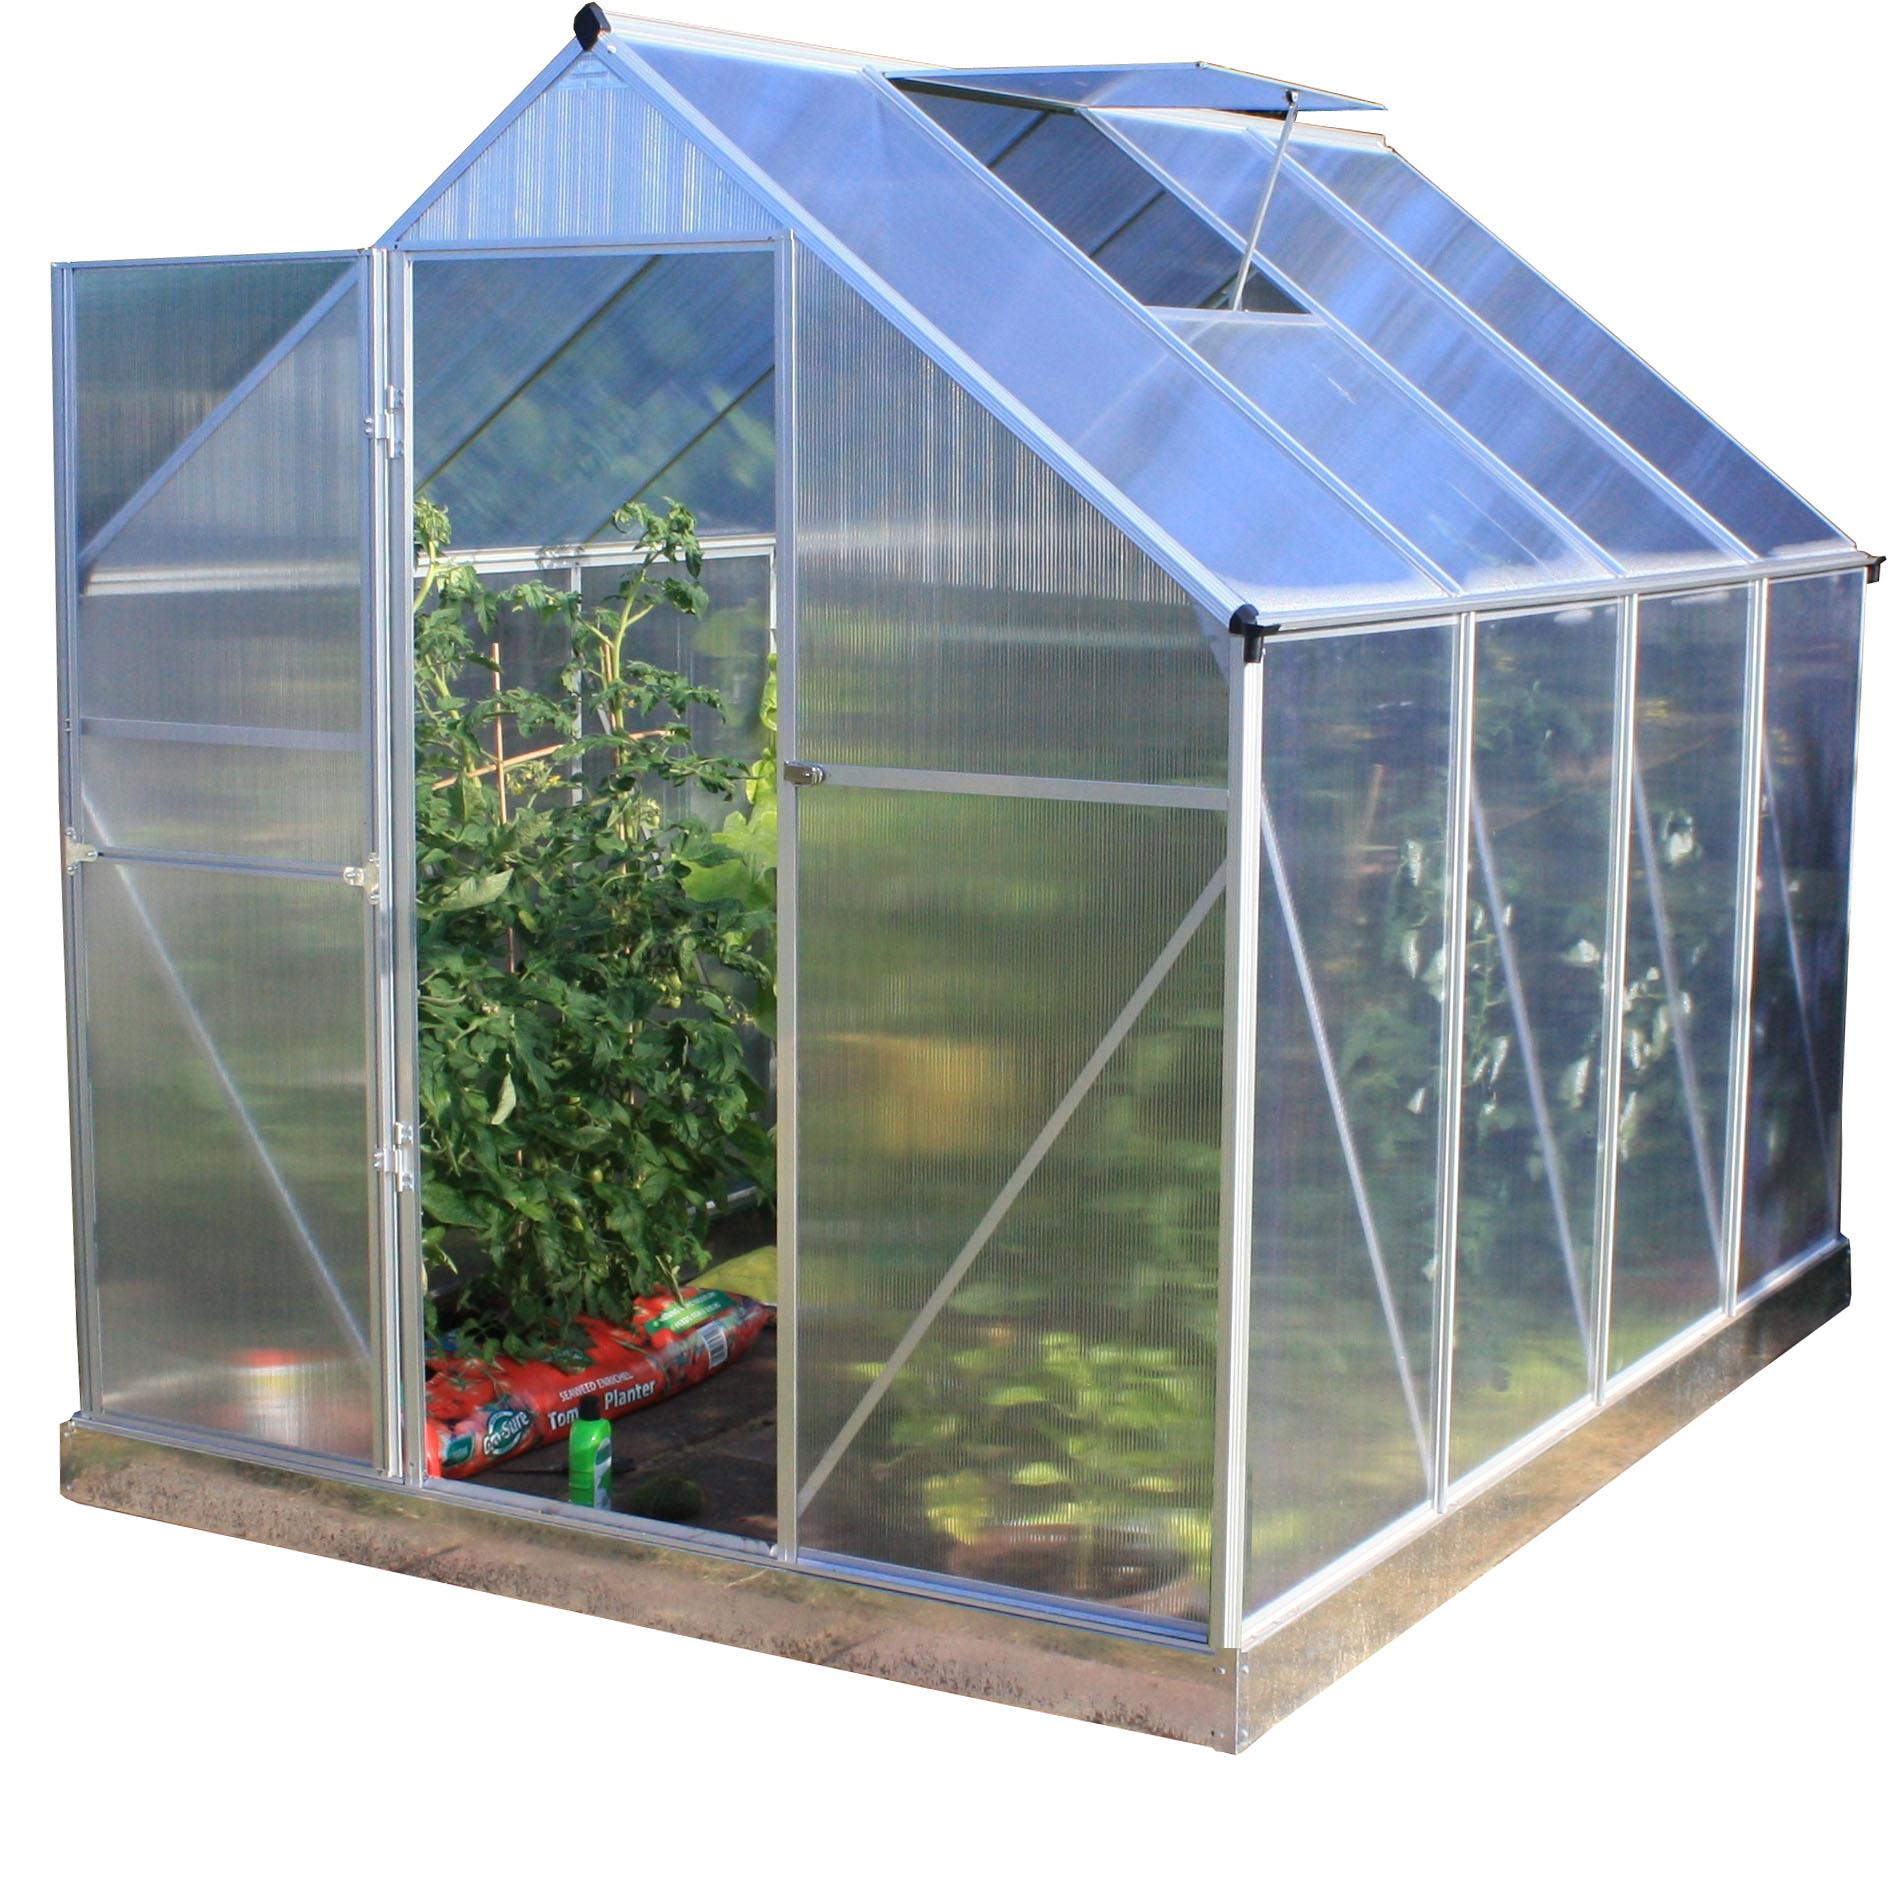 Woodside aluminium polycarbonate greenhouse buildings outdoor value - Serre aluminium polycarbonate ...